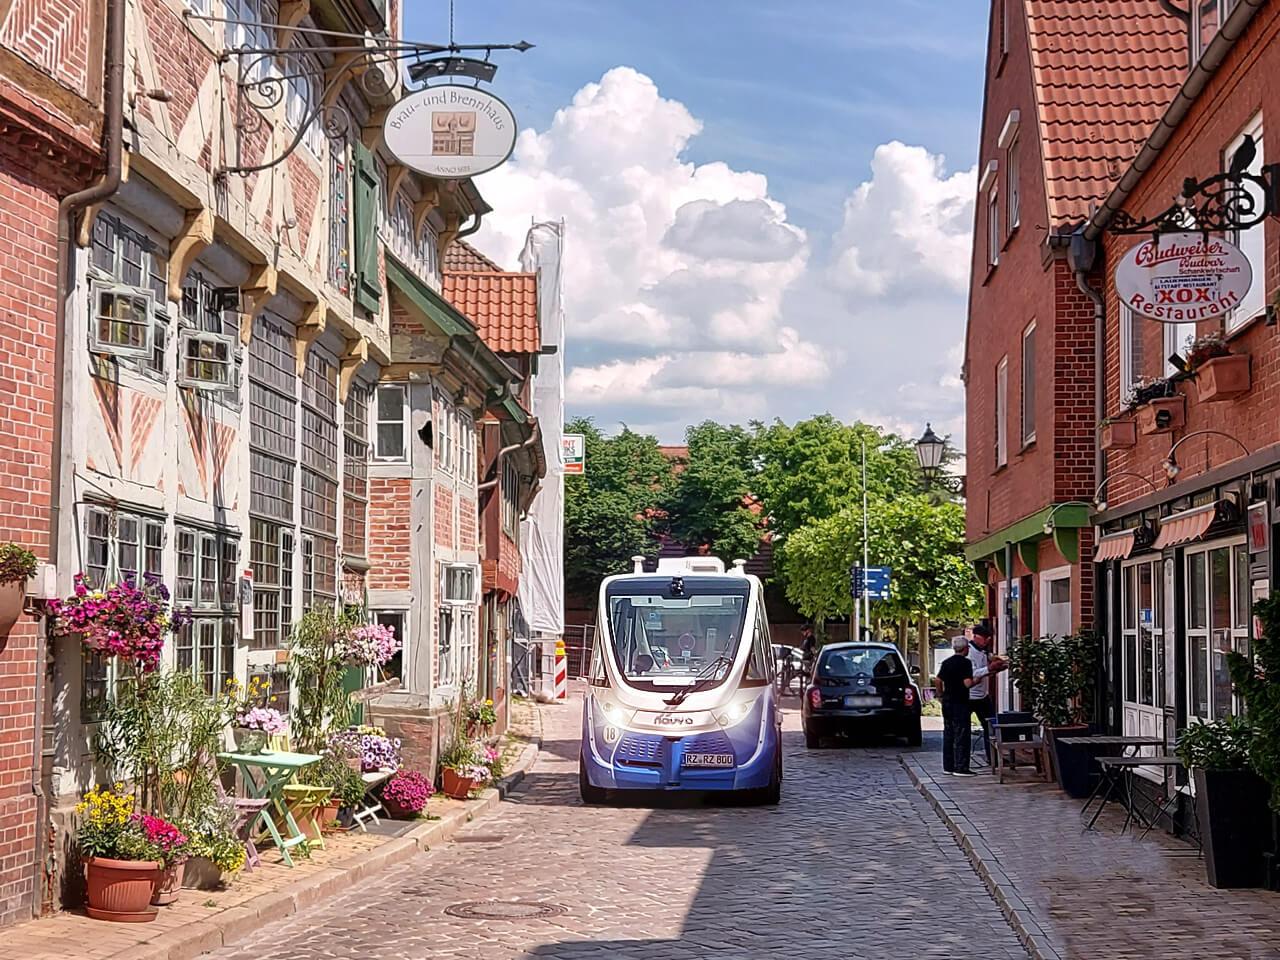 TaBuLa - Im fahrerlosen Bus durch Lauenburg